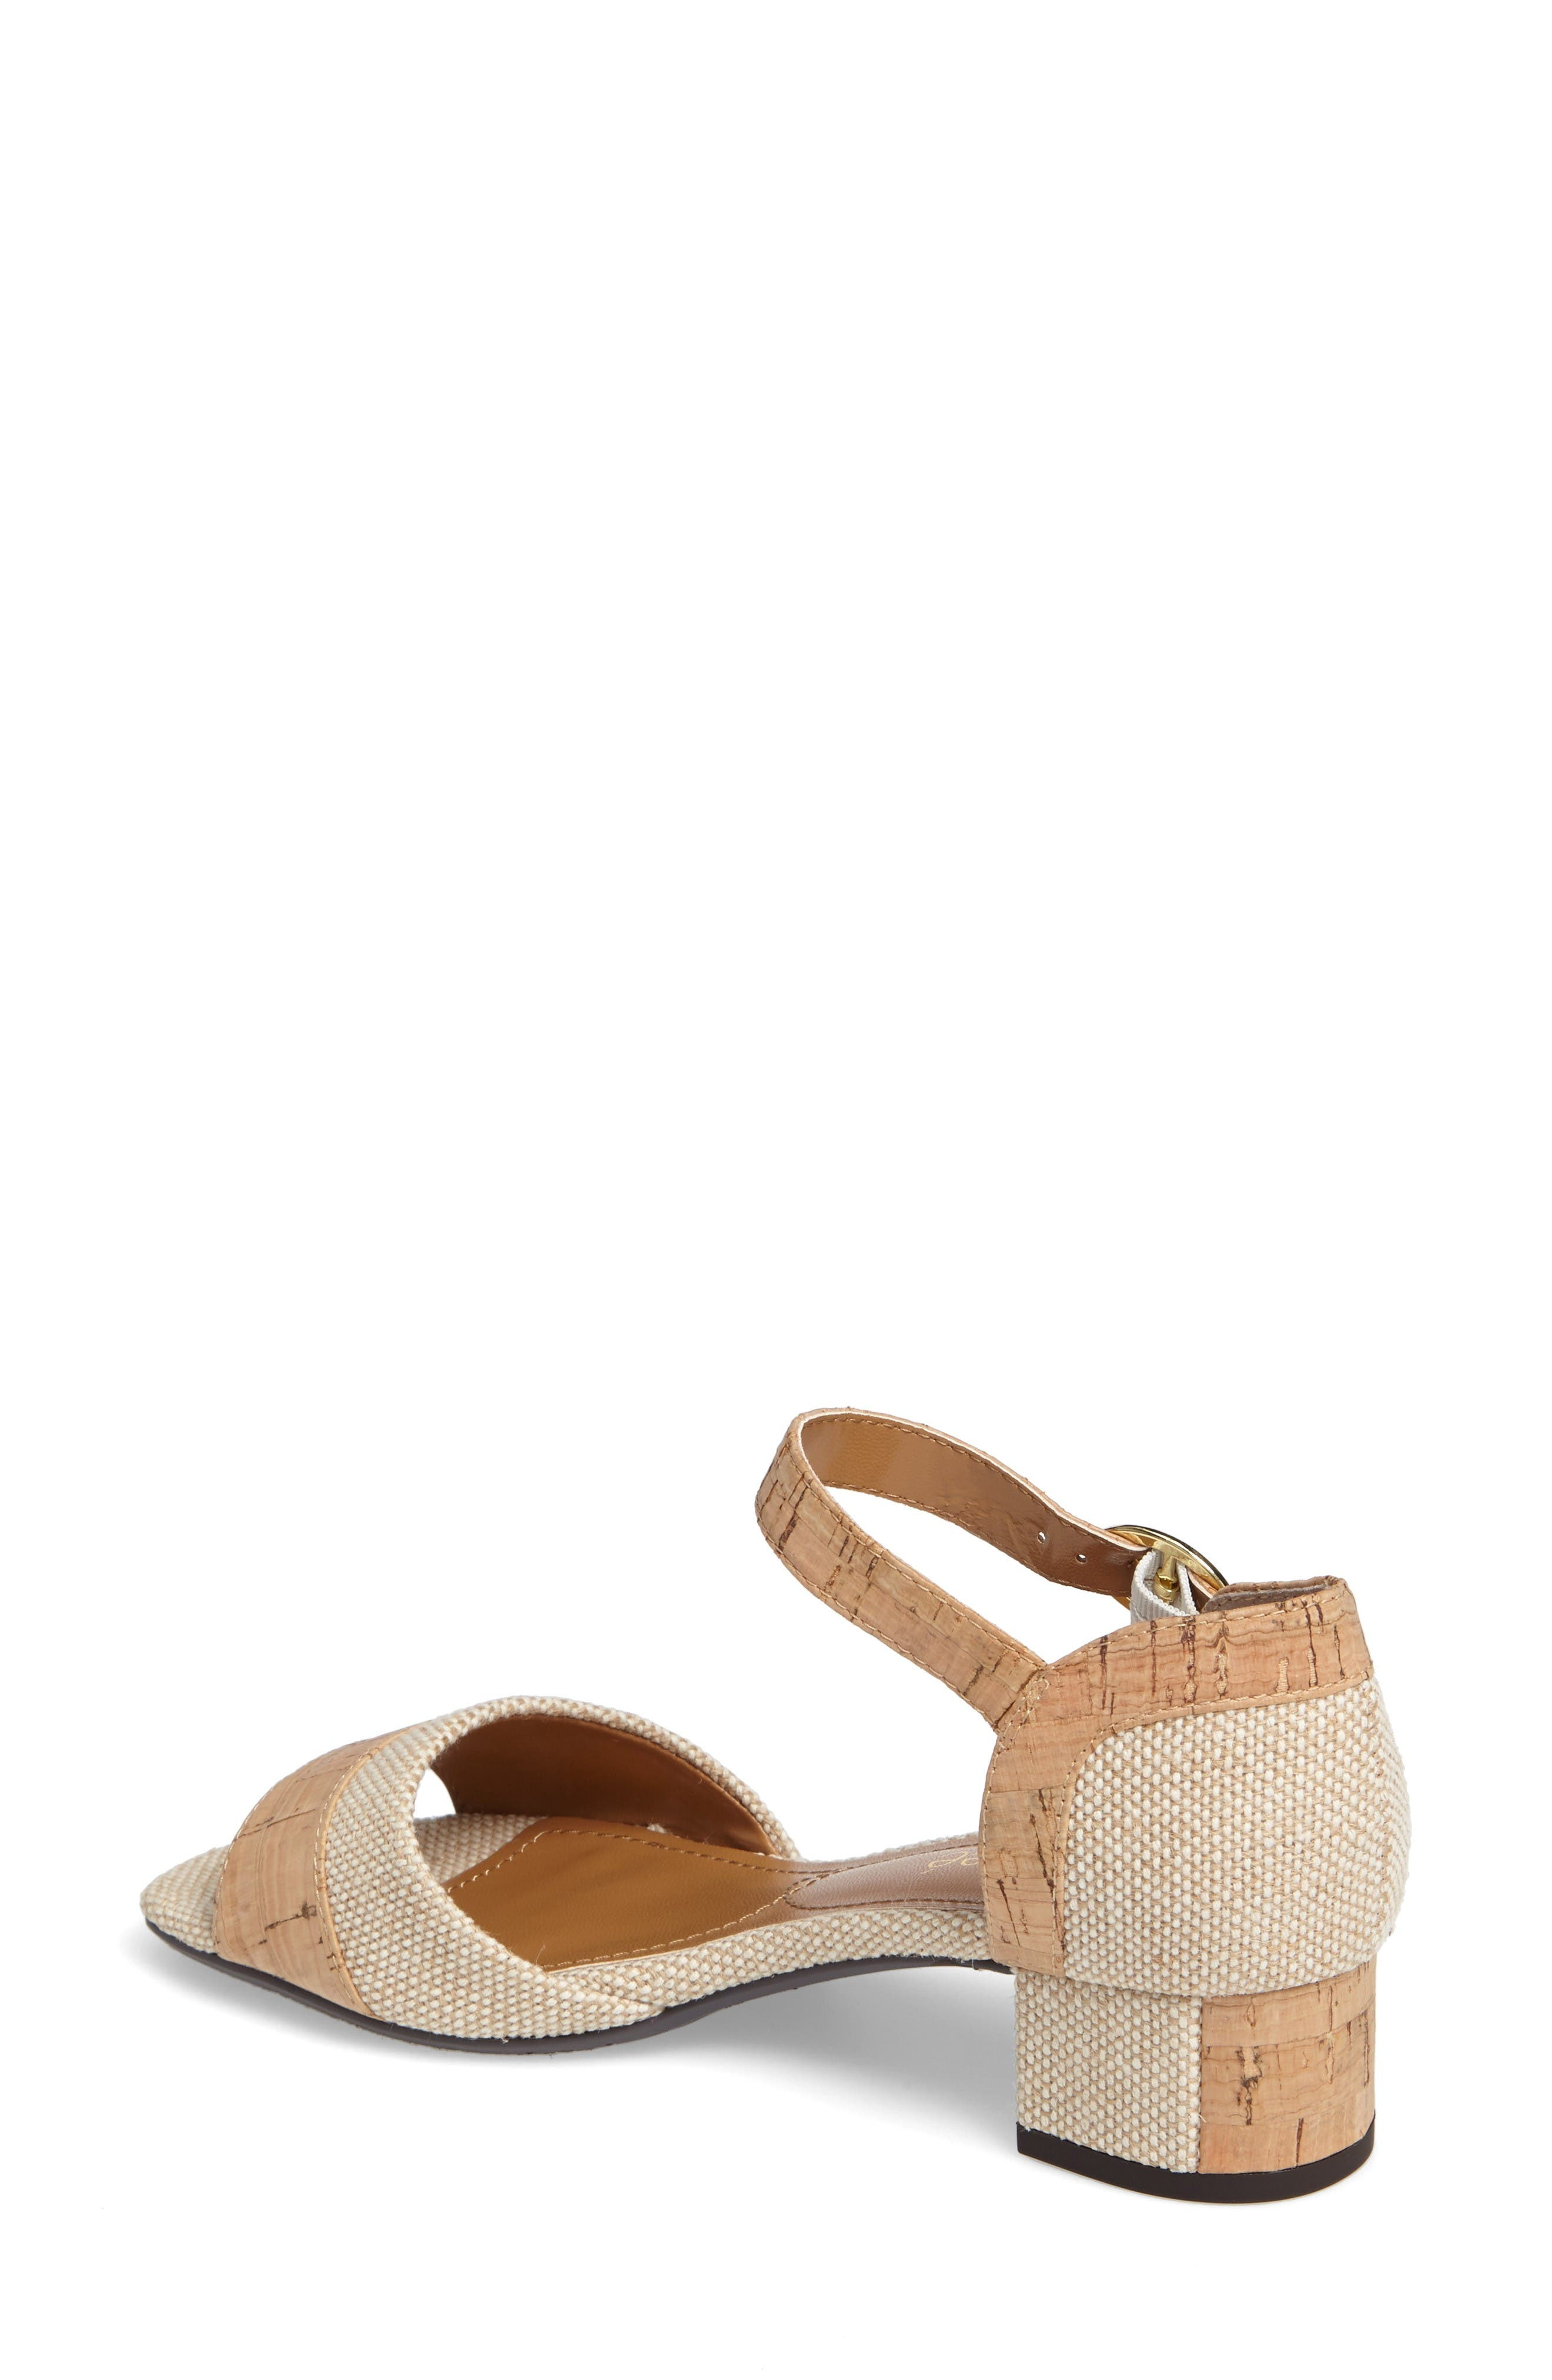 Pebblebeach Block Heel Sandal,                             Alternate thumbnail 2, color,                             Natural/ Cork Fabric